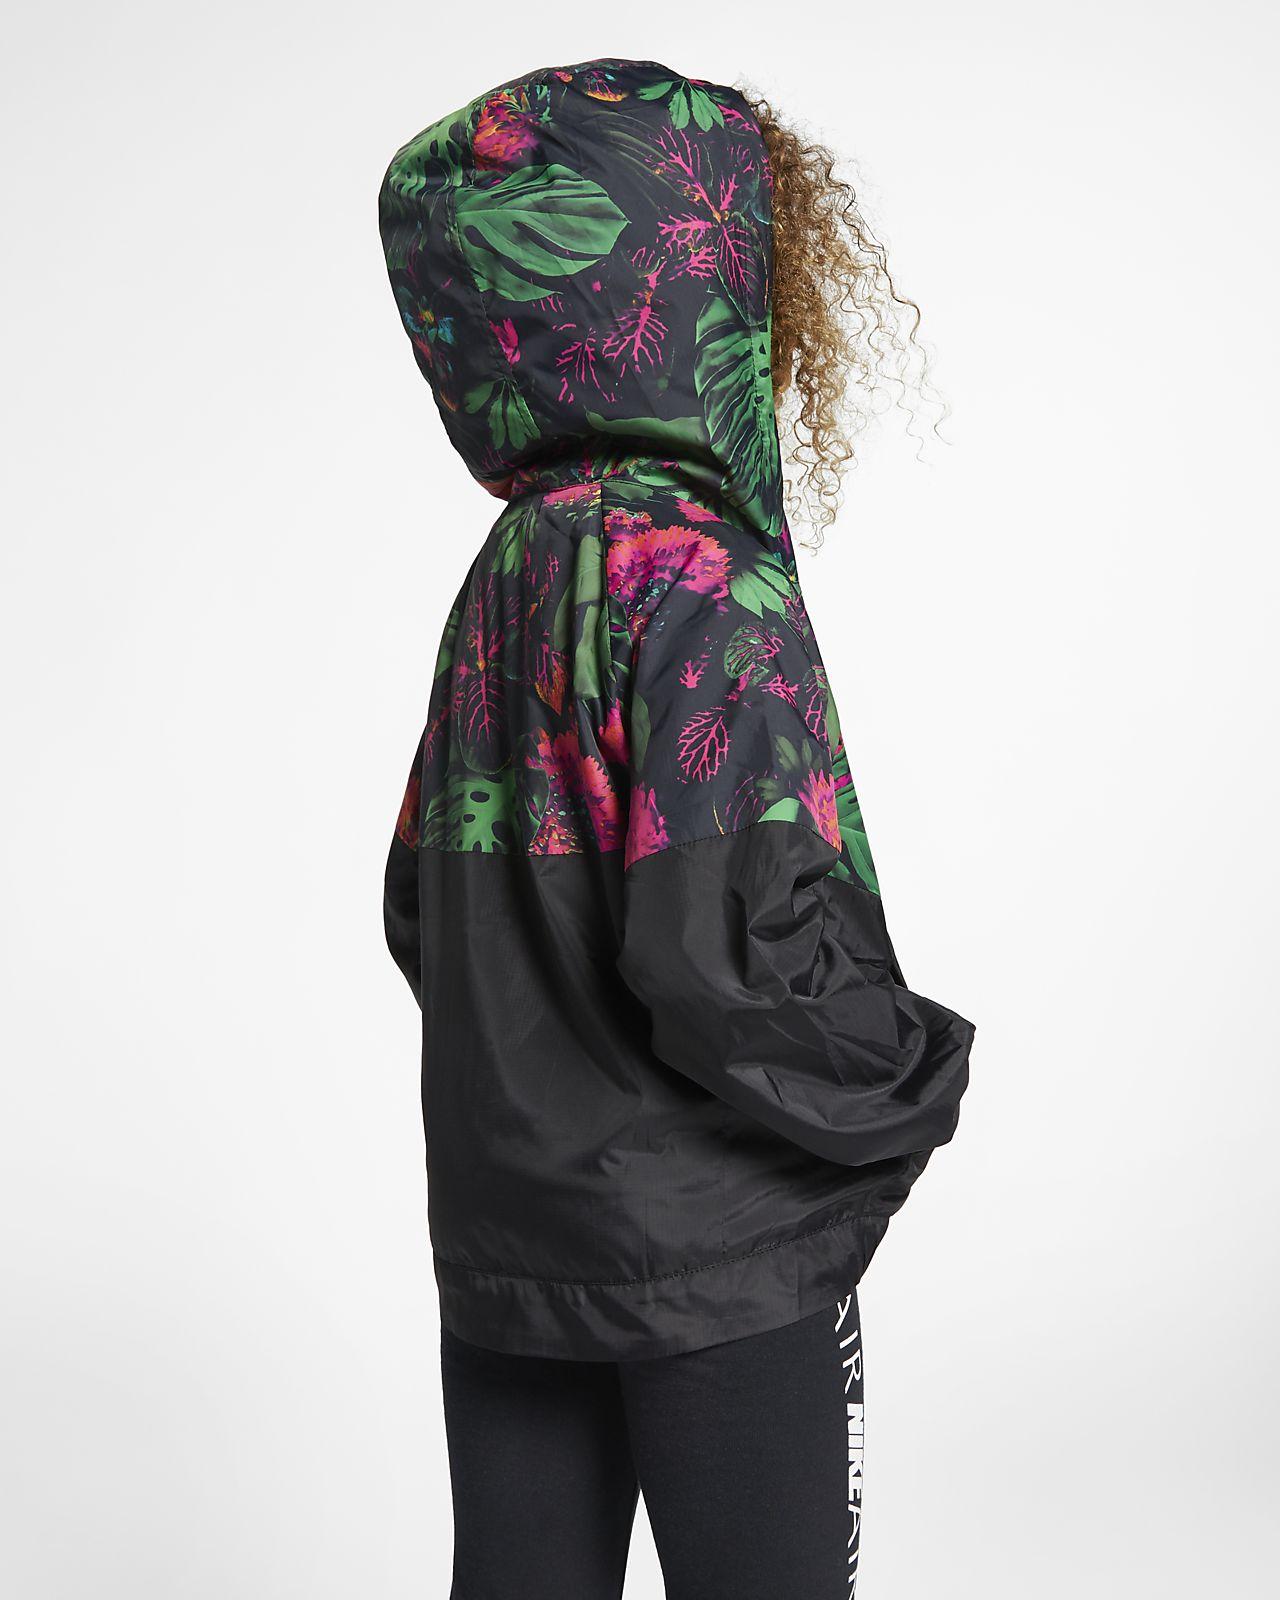 c067c7cb111 Nike Sportswear Windrunner Little Kids' Floral Jacket. Nike.com